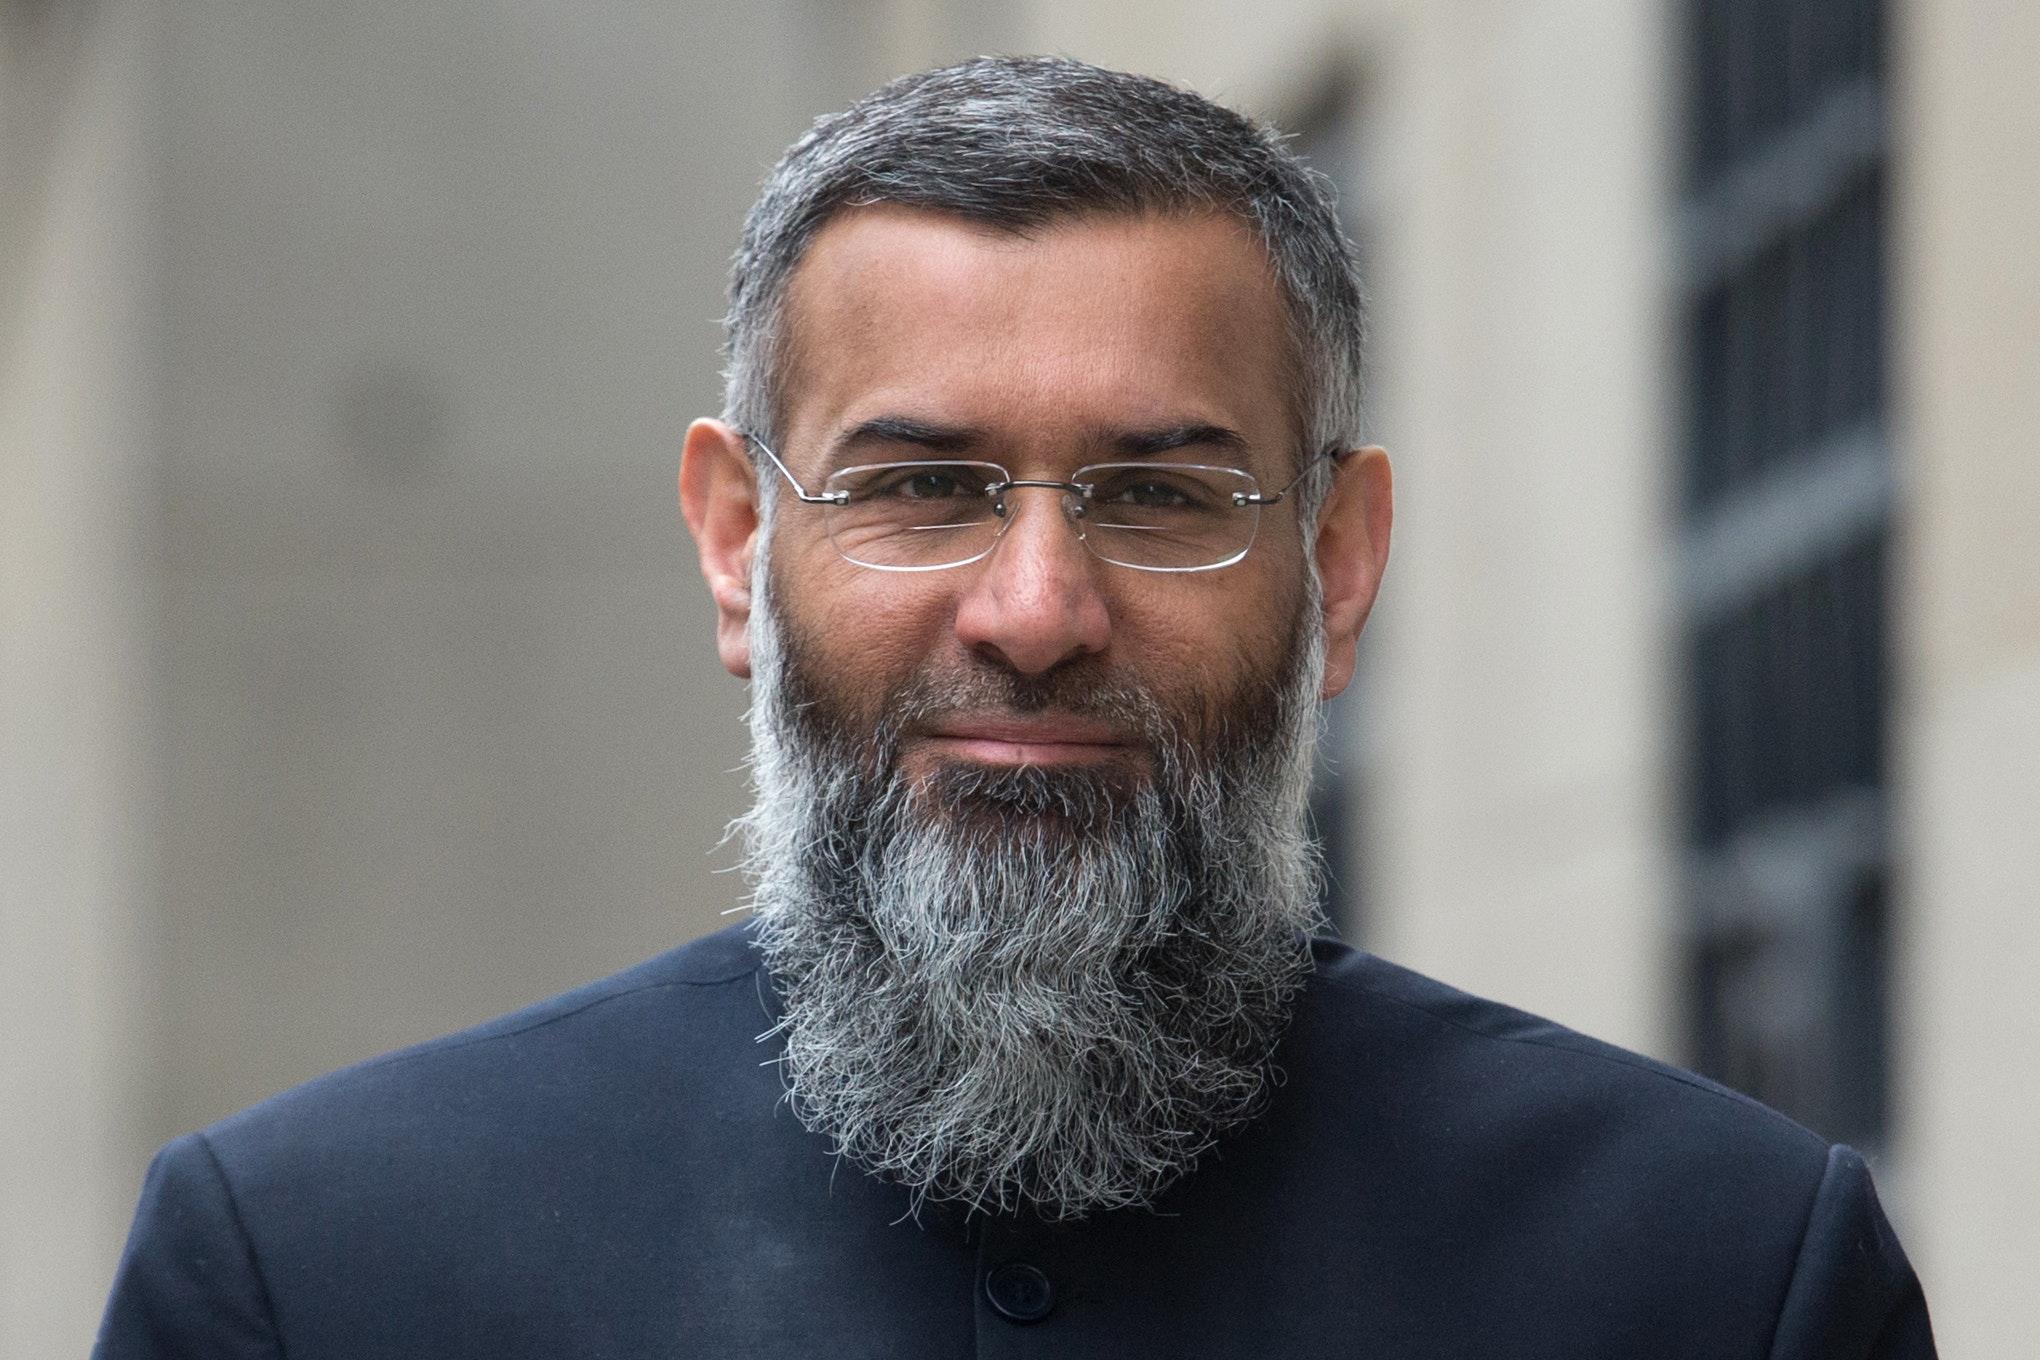 U.K. Lifts speaking Ban On Anjem Choudary